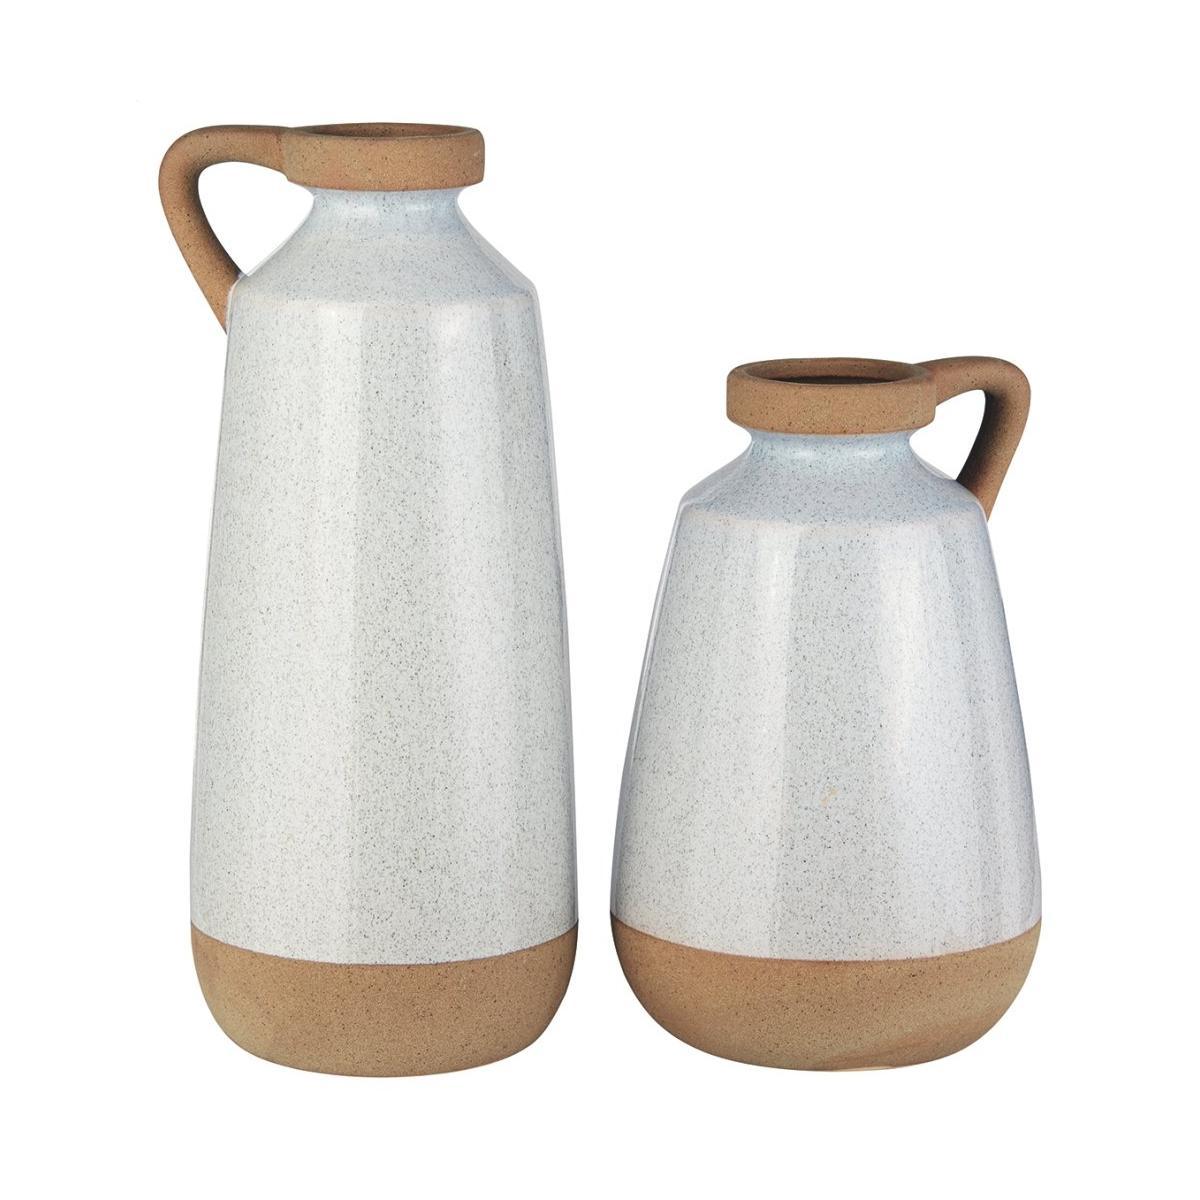 Tilbury Vase (set of 2)